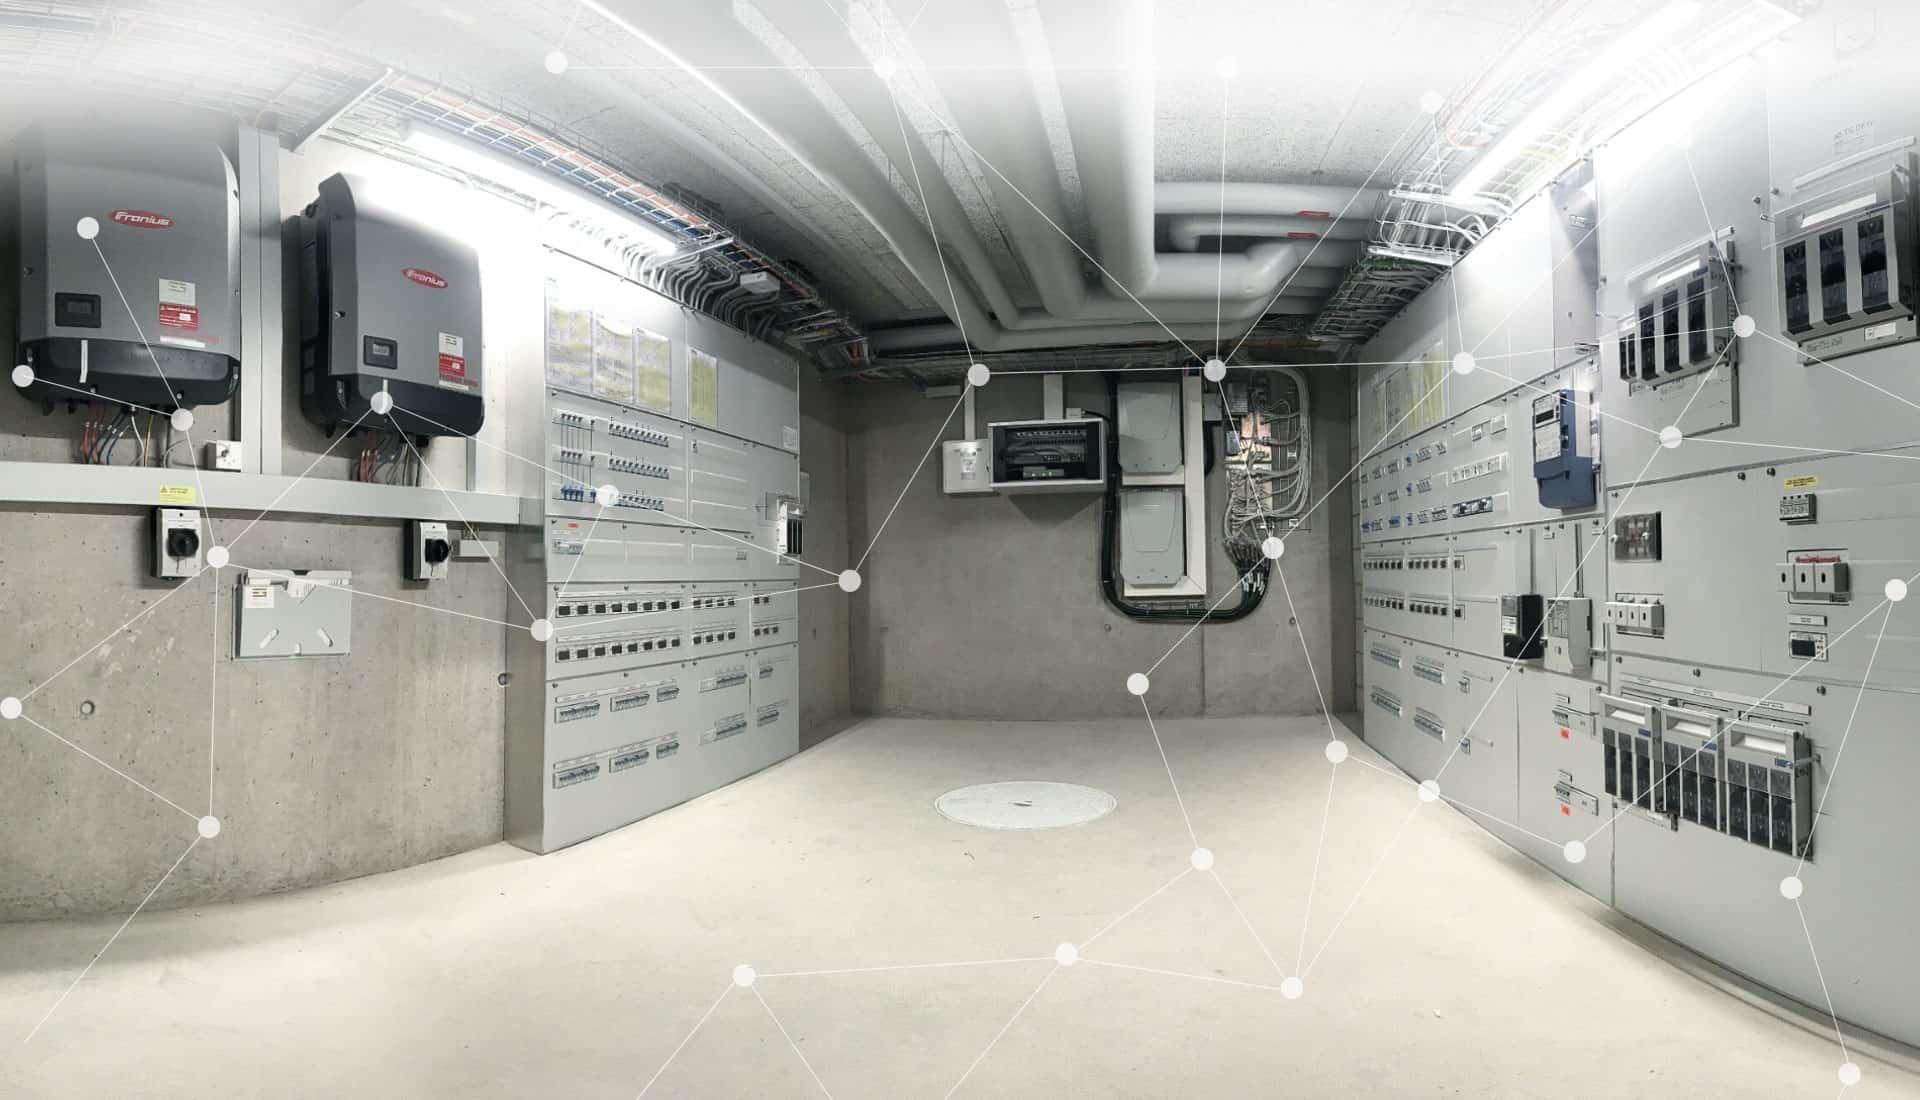 intelligente systemarchitektur elektroplanung photovoltaikanlage e-Mobility elektro ladestation leitsystem faciltymanagement elmaplan ag